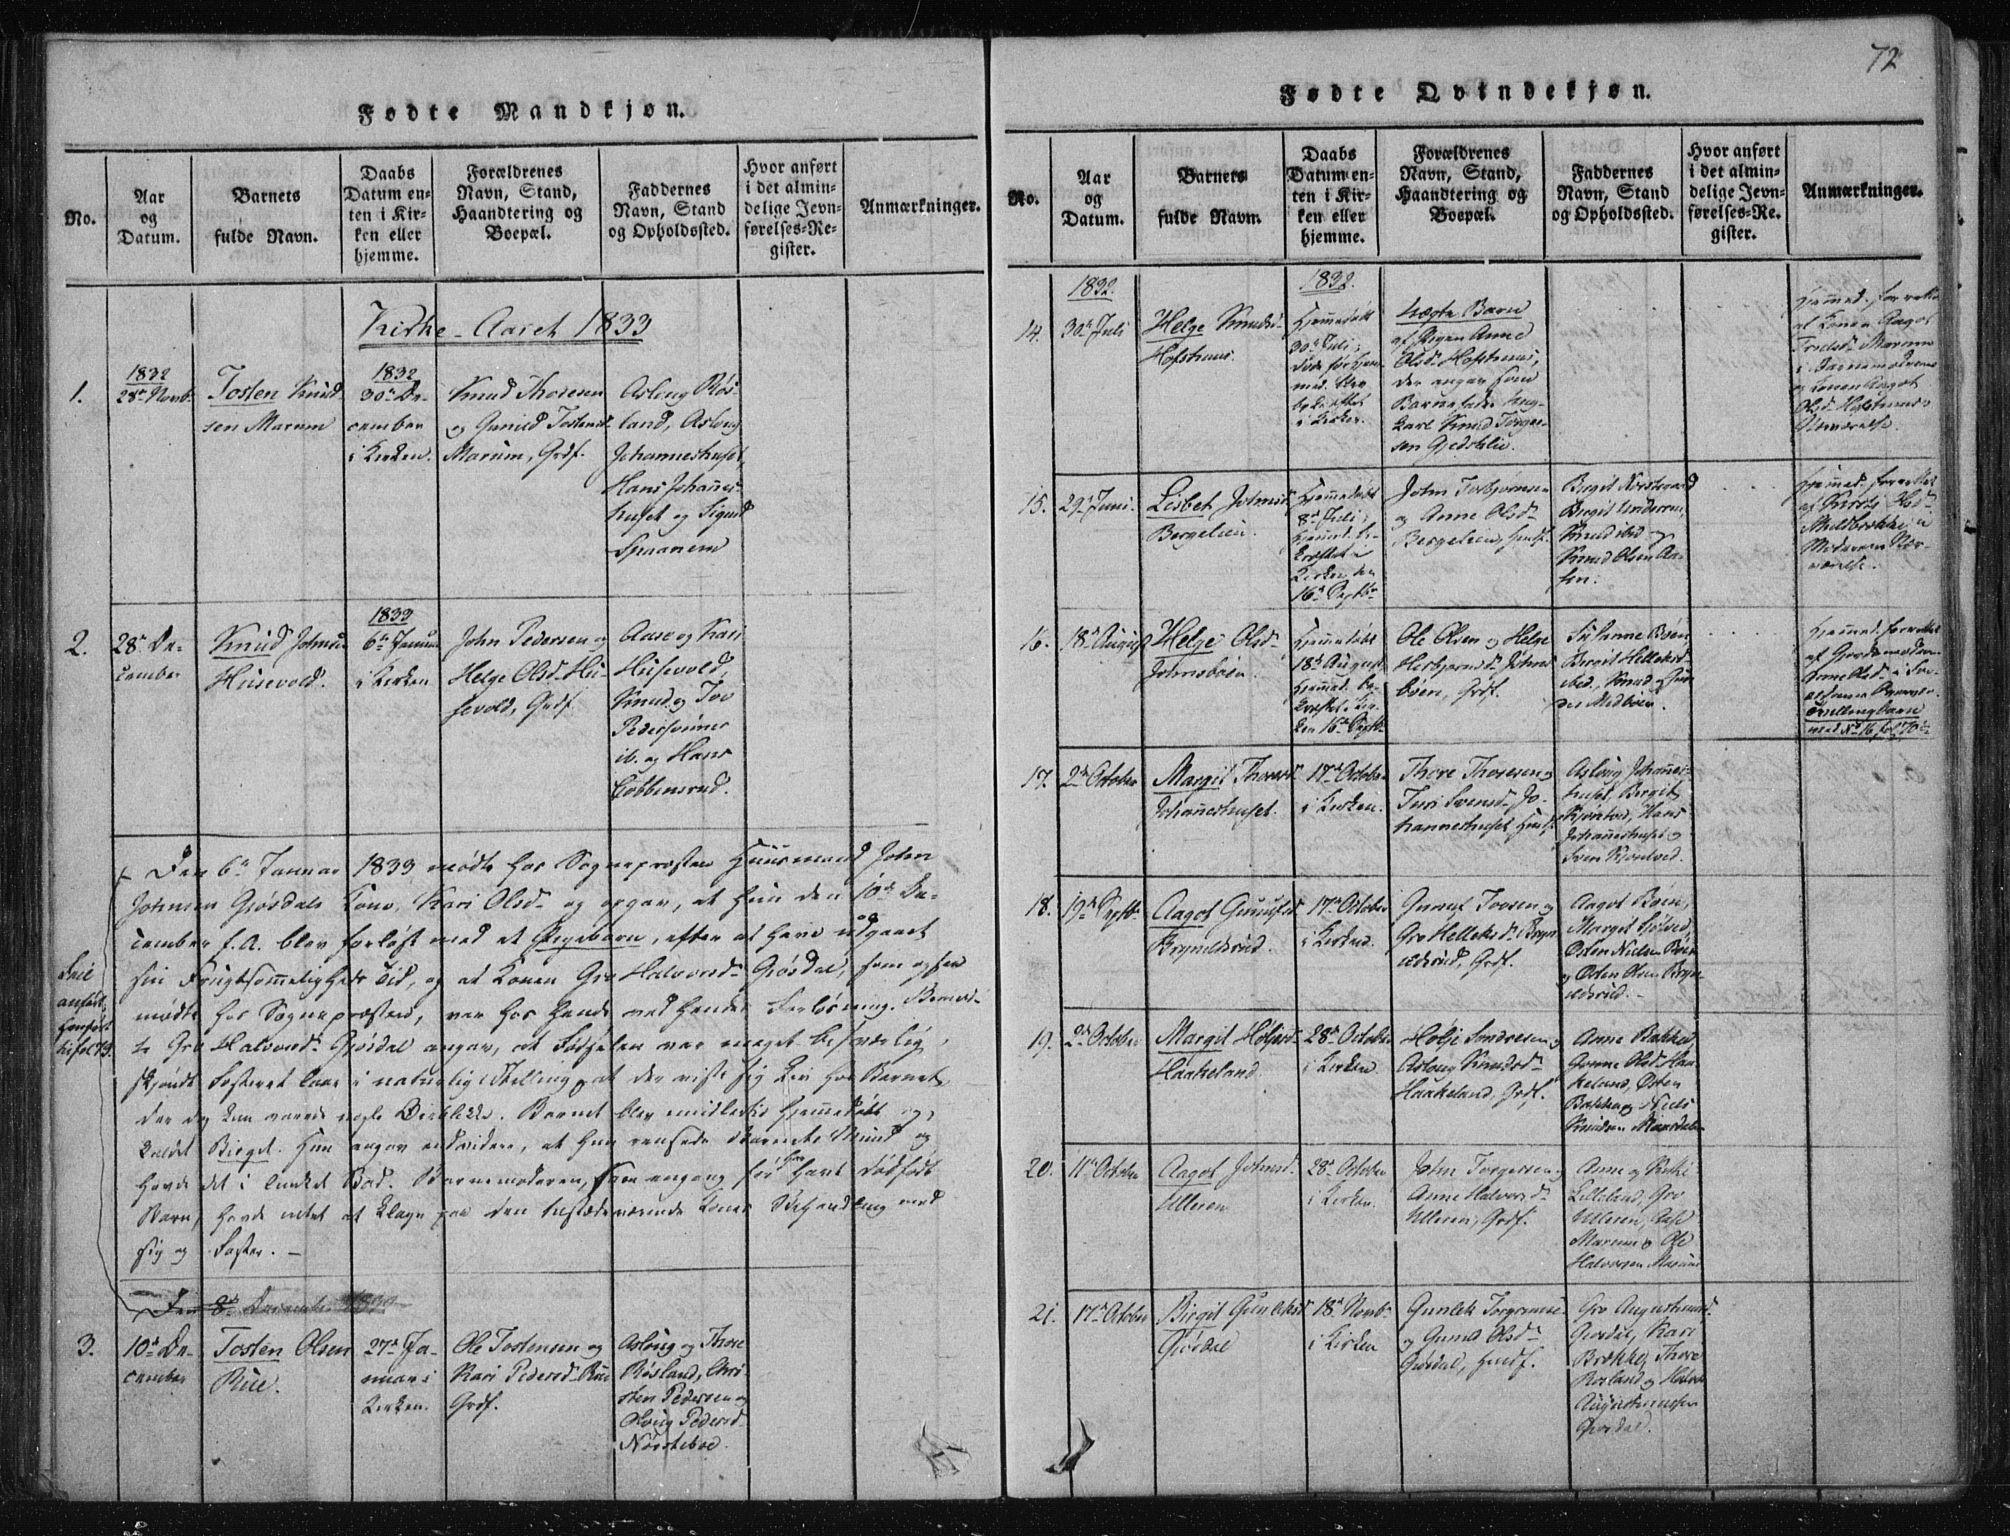 SAKO, Tinn kirkebøker, F/Fa/L0004: Ministerialbok nr. I 4, 1815-1843, s. 72